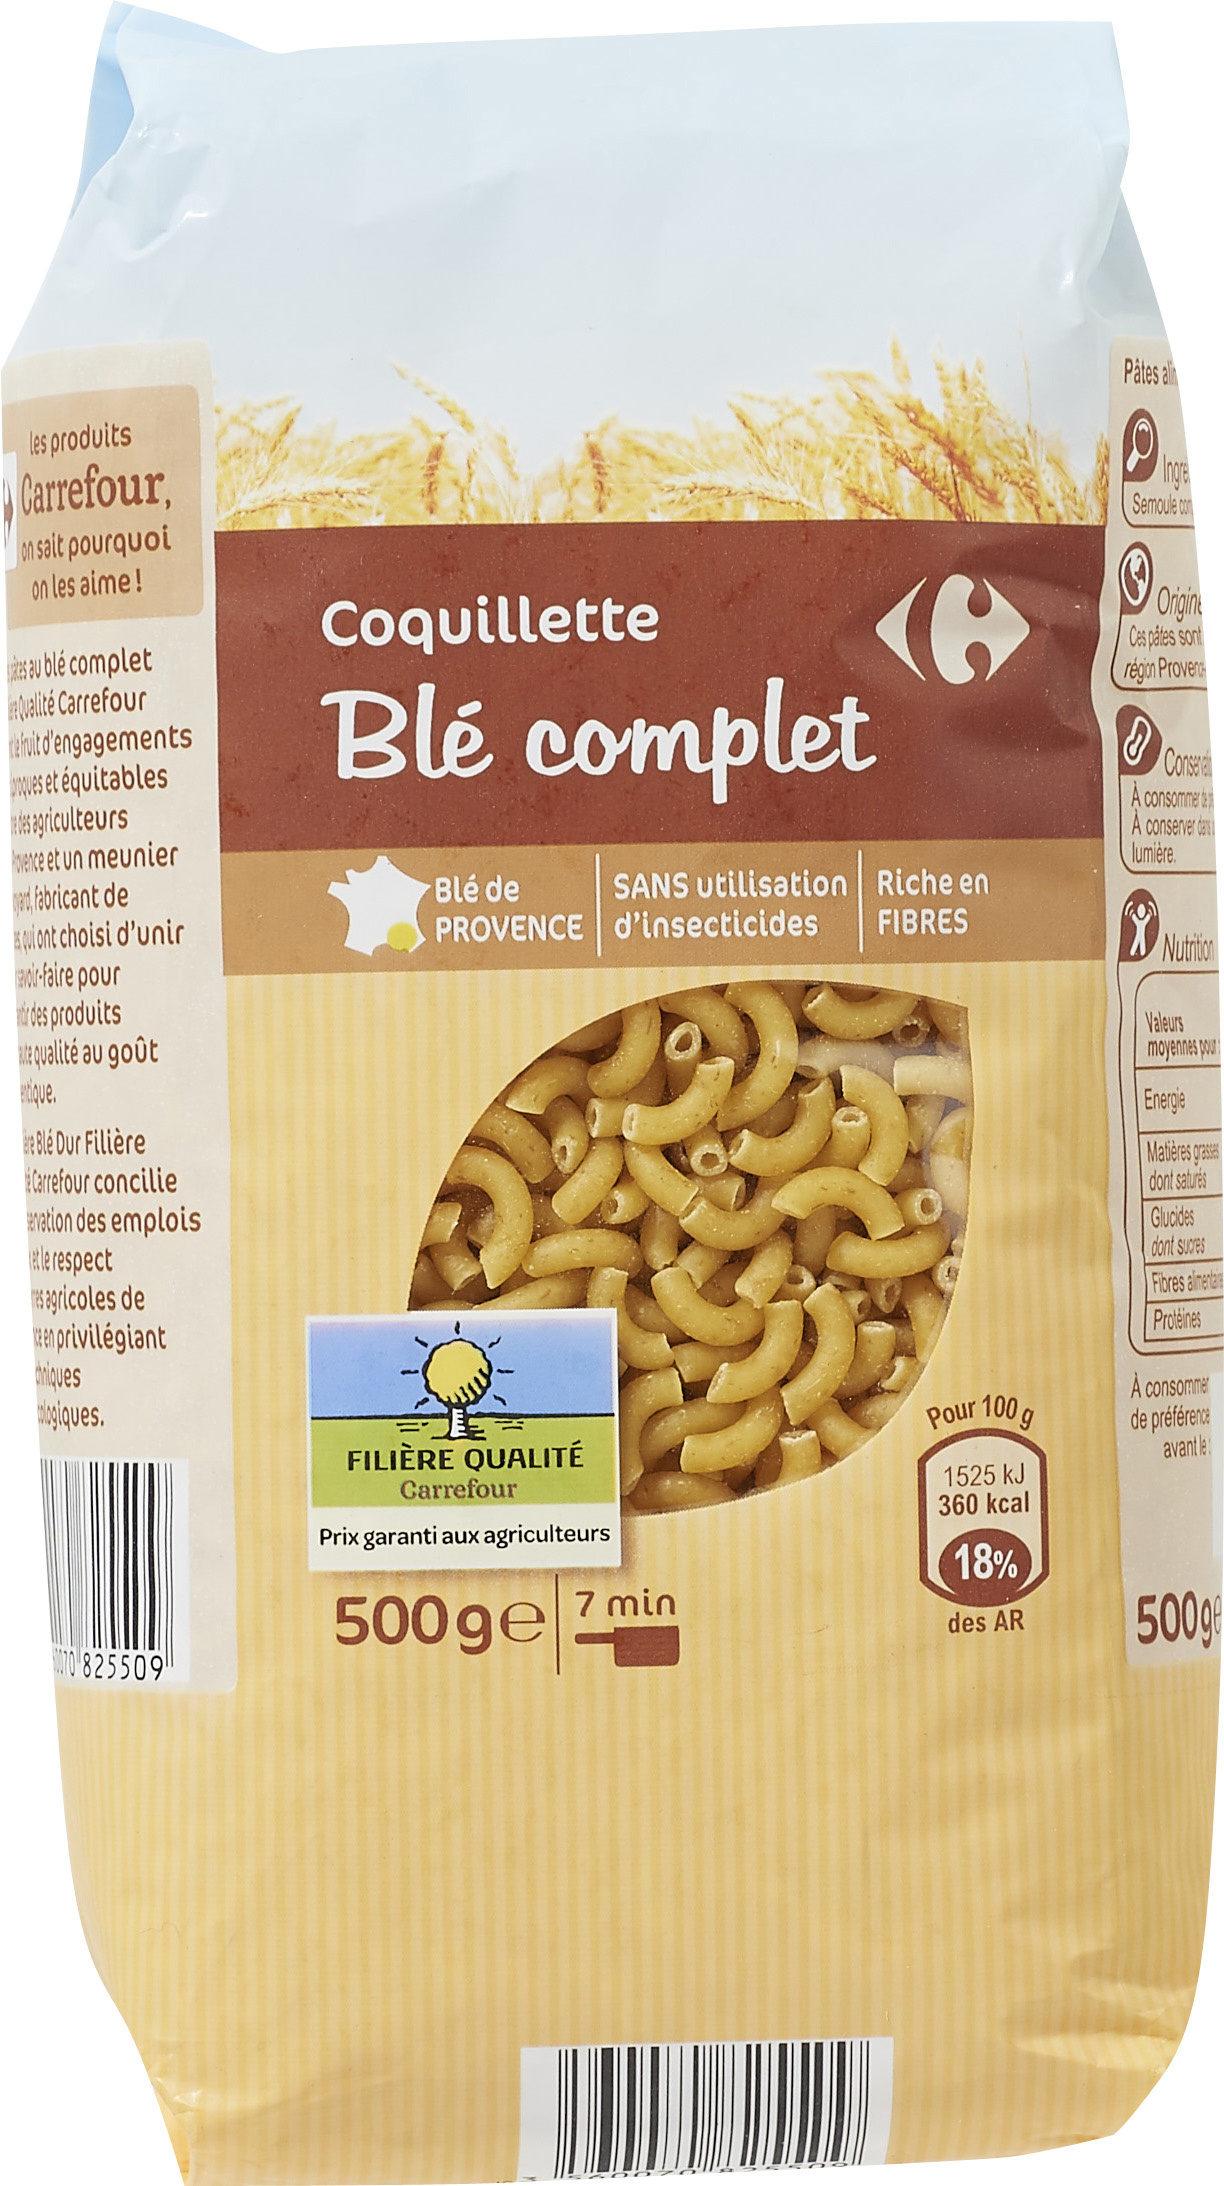 Coquillette Blé complet - Product - fr